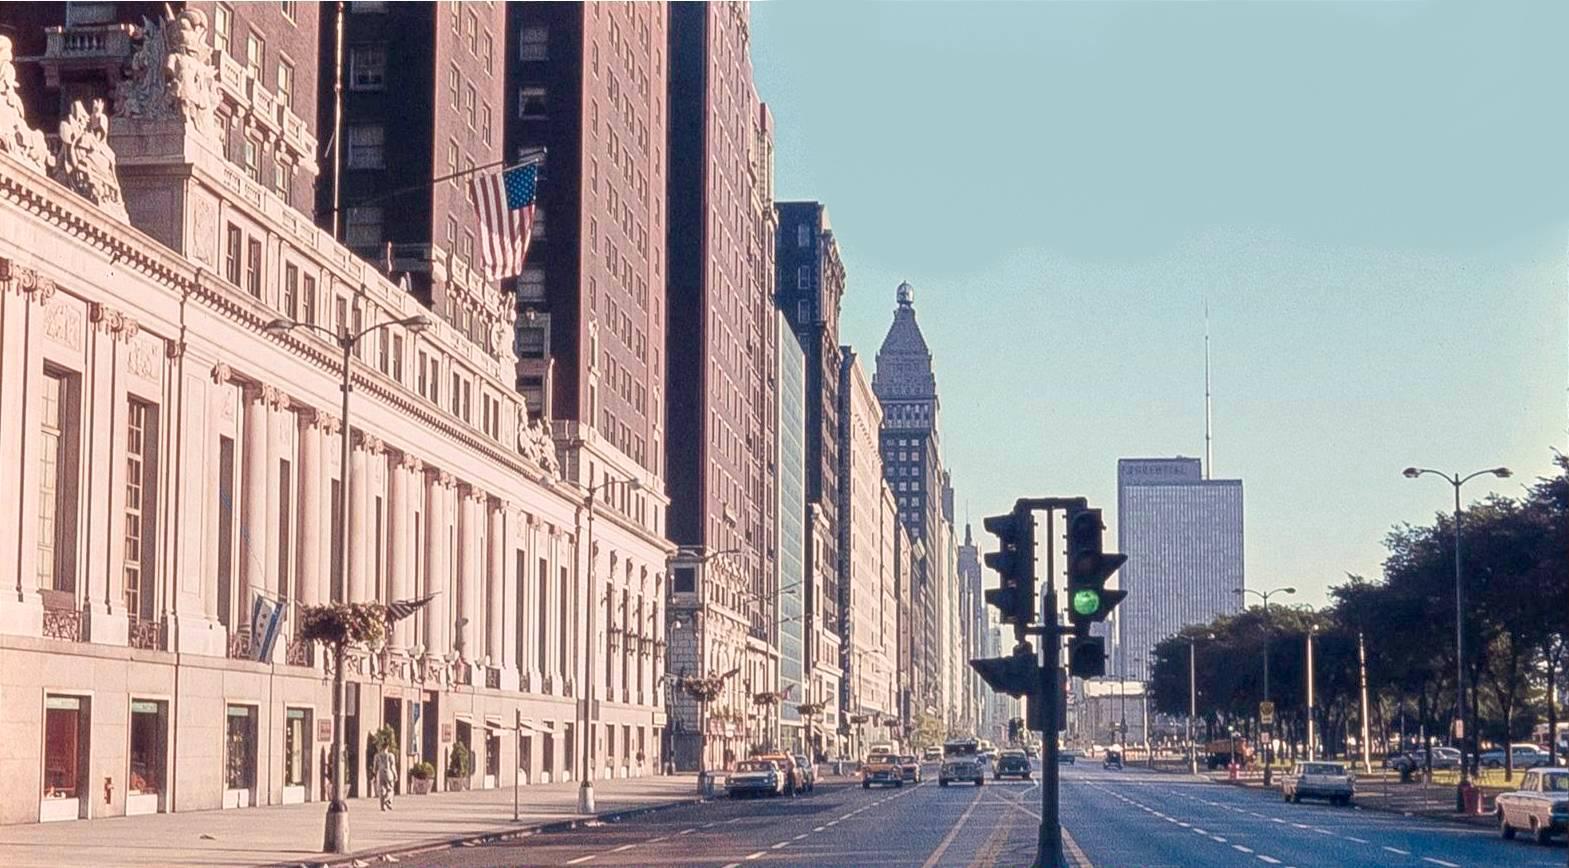 CHUCKMAN\'S COLLECTION (CHICAGO POSTCARDS) VOLUME 06